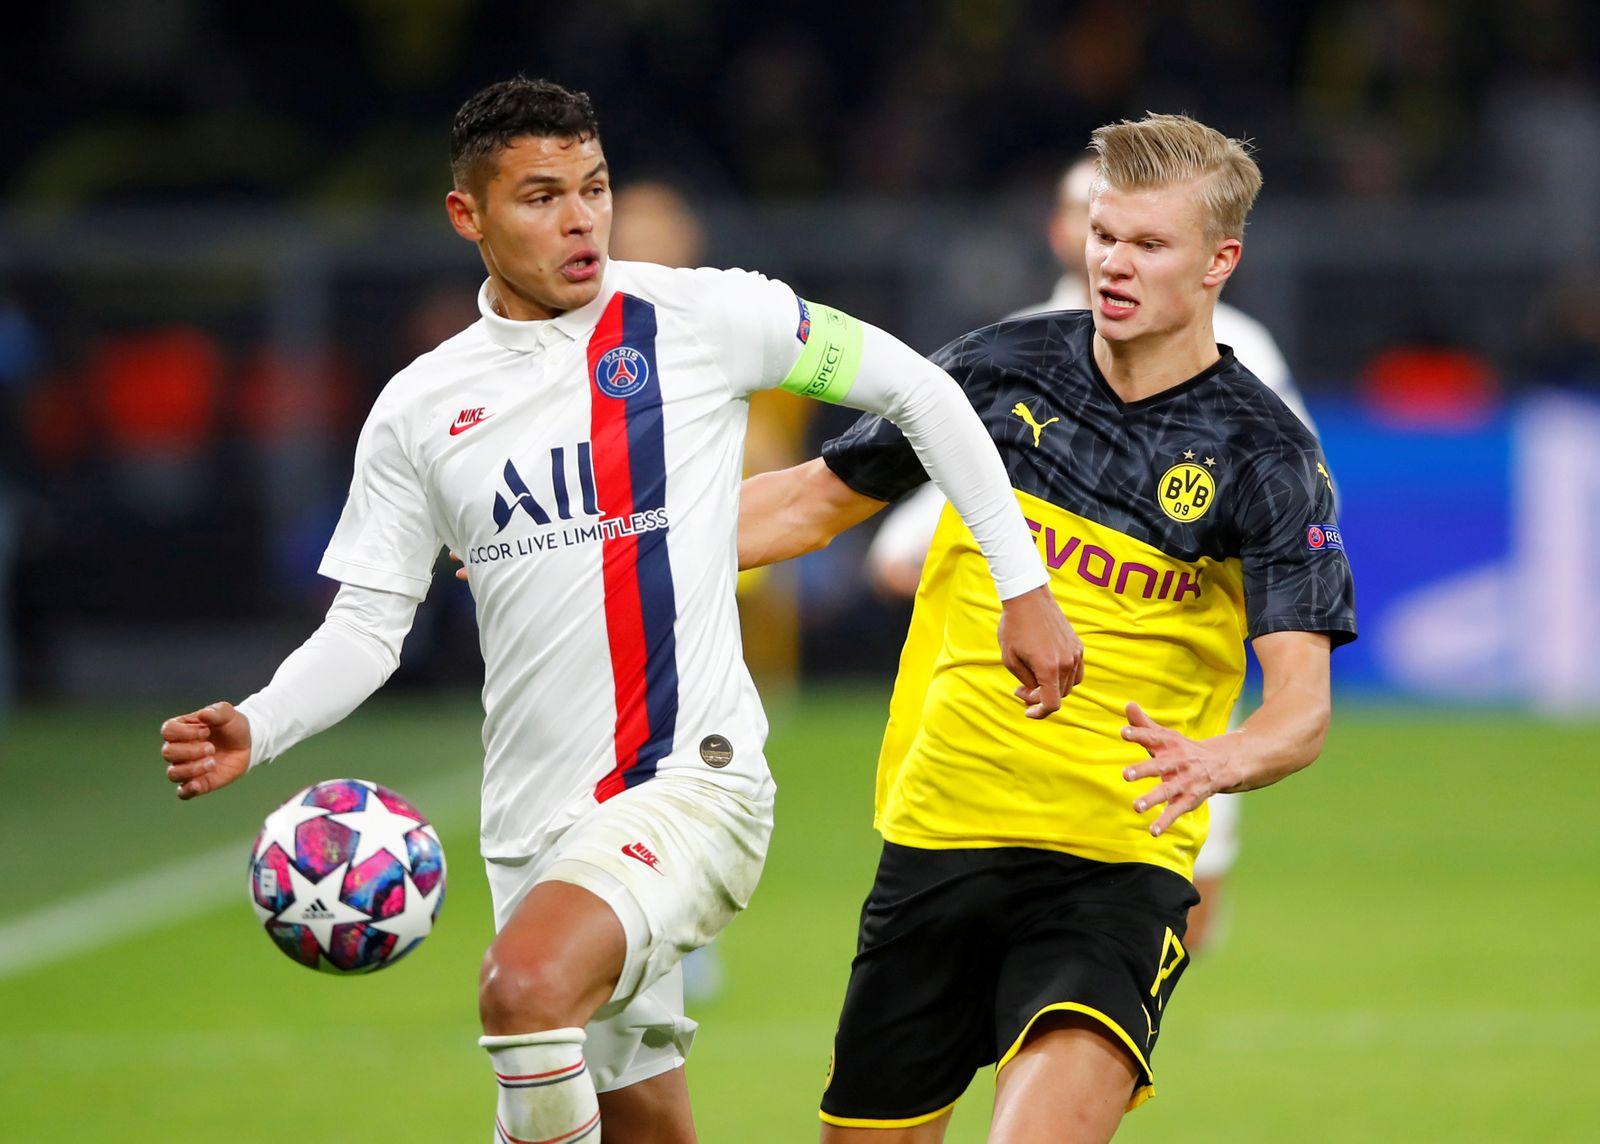 FILE PHOTO: Champions League - Round of 16 First Leg - Borussia Dortmund v Paris St Germain